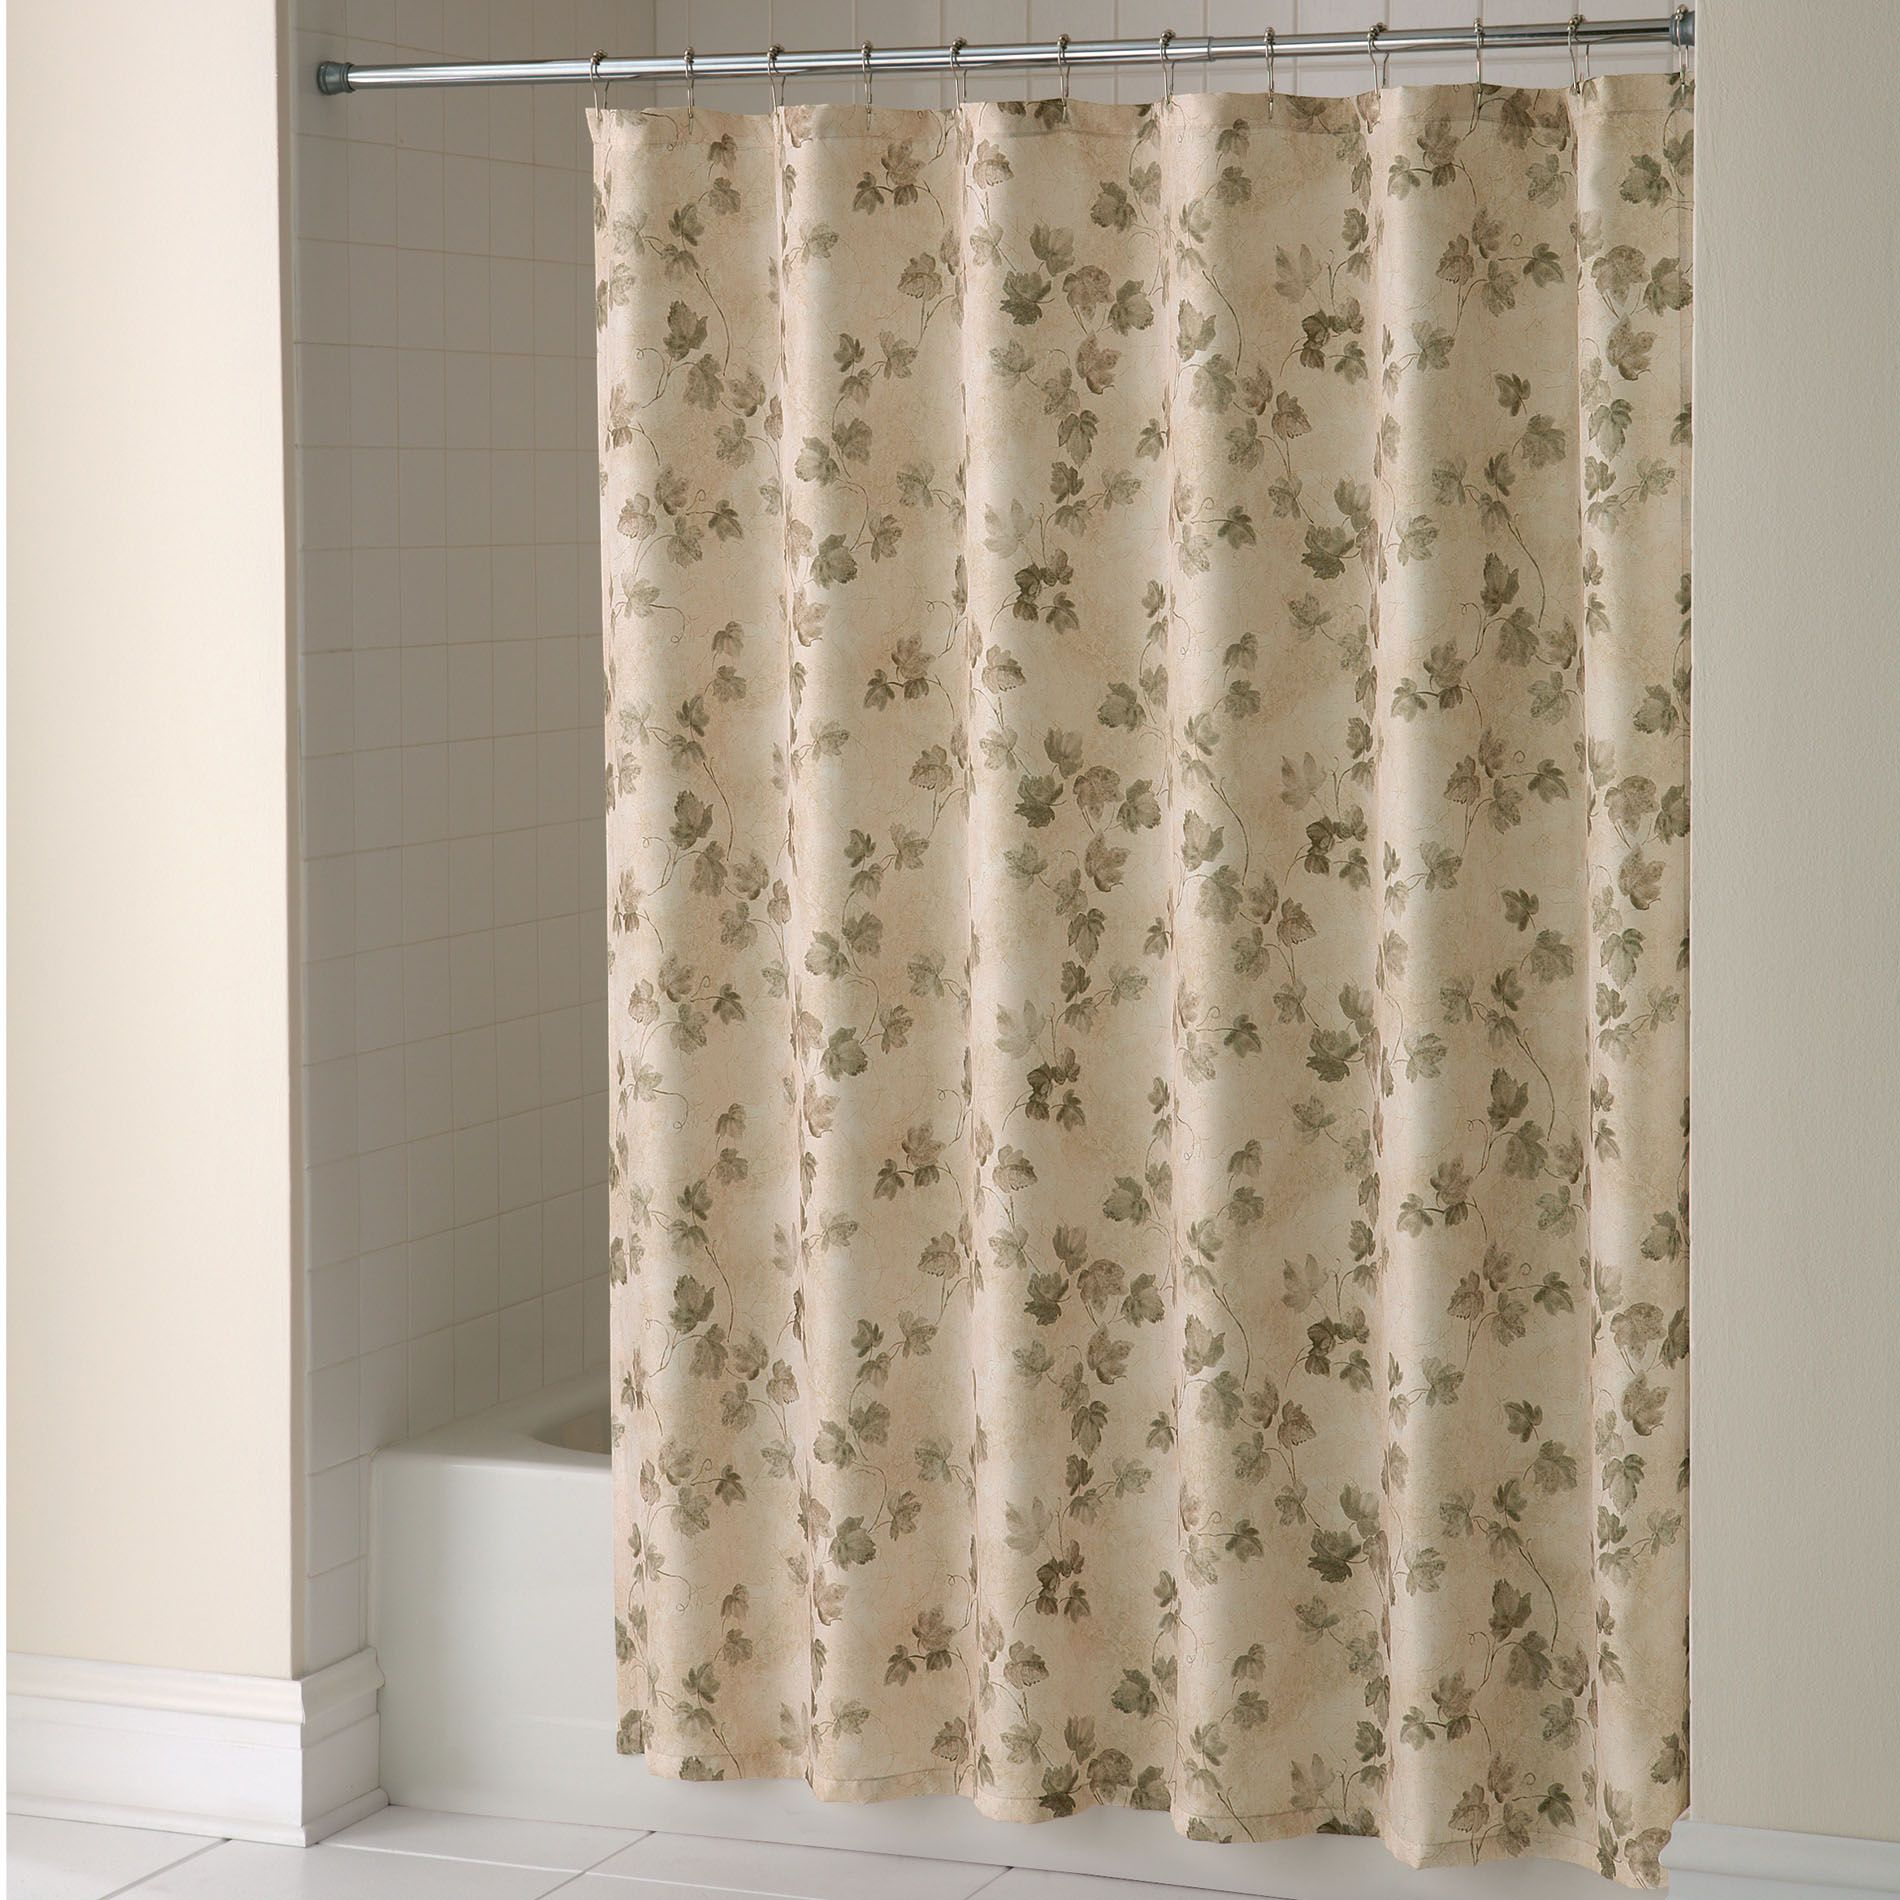 Kmart Curtains Home Decor Interior Design And Color